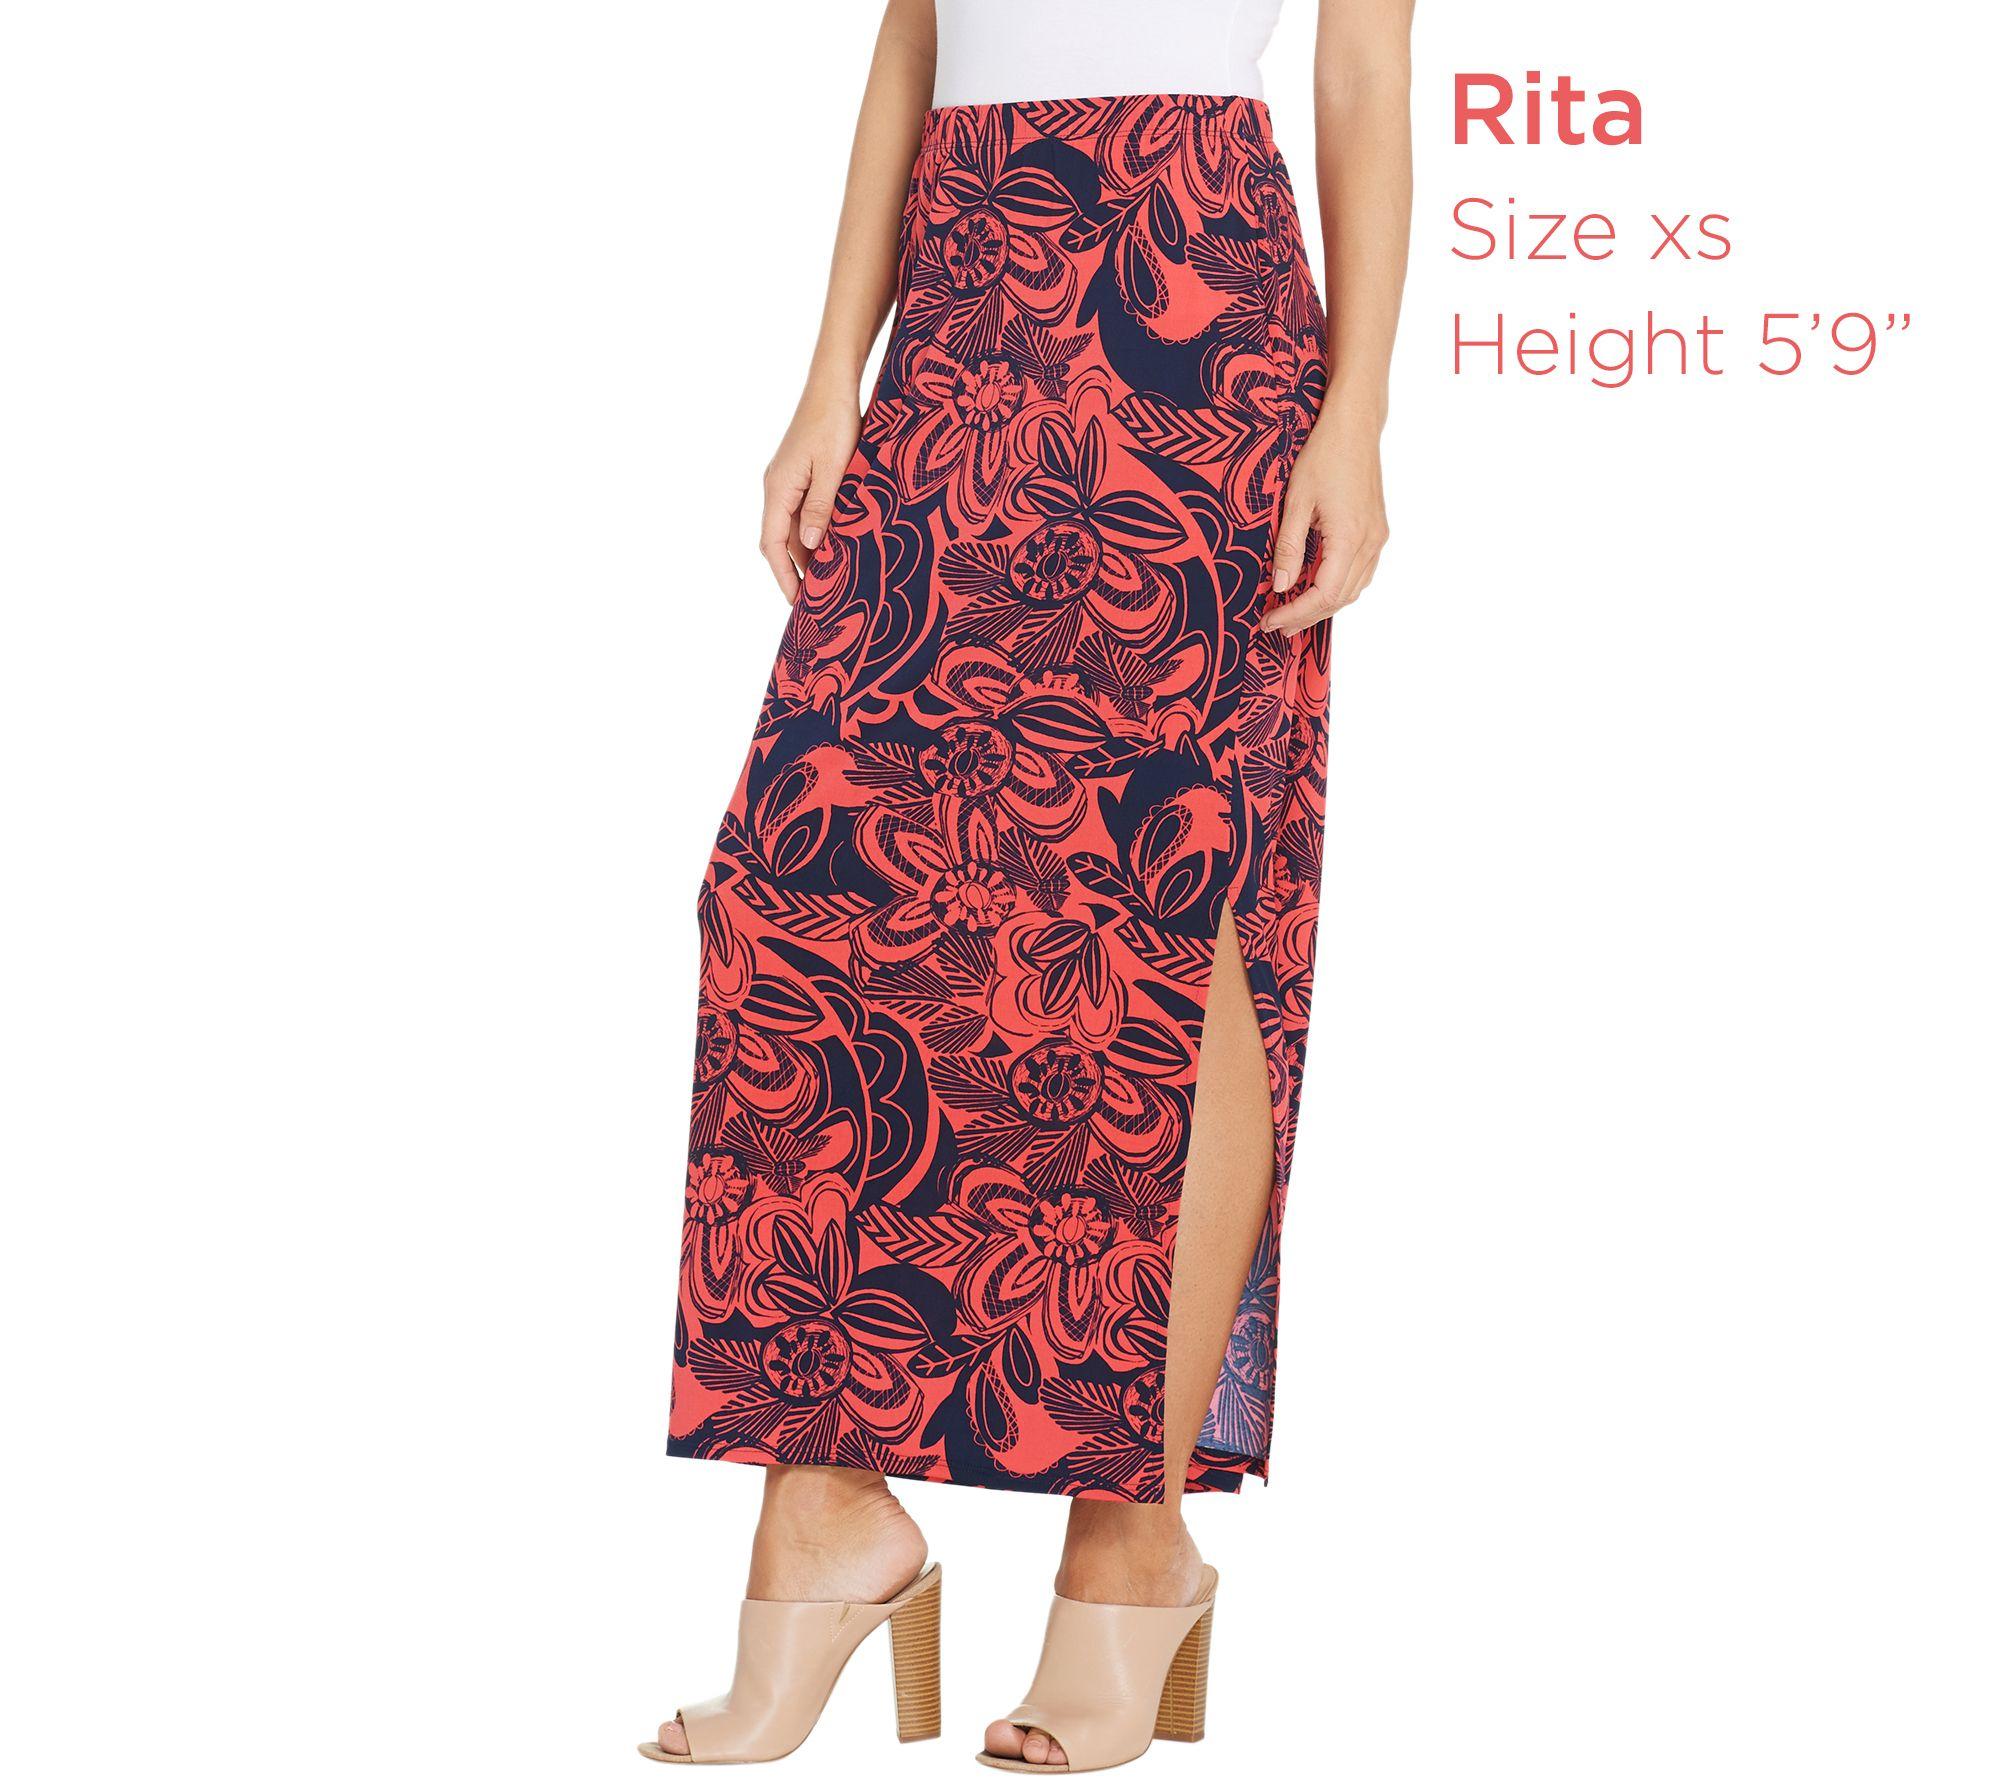 8faed3a510 Susan Graver Regular Printed Liquid Knit Maxi Skirt - Page 1 — QVC.com